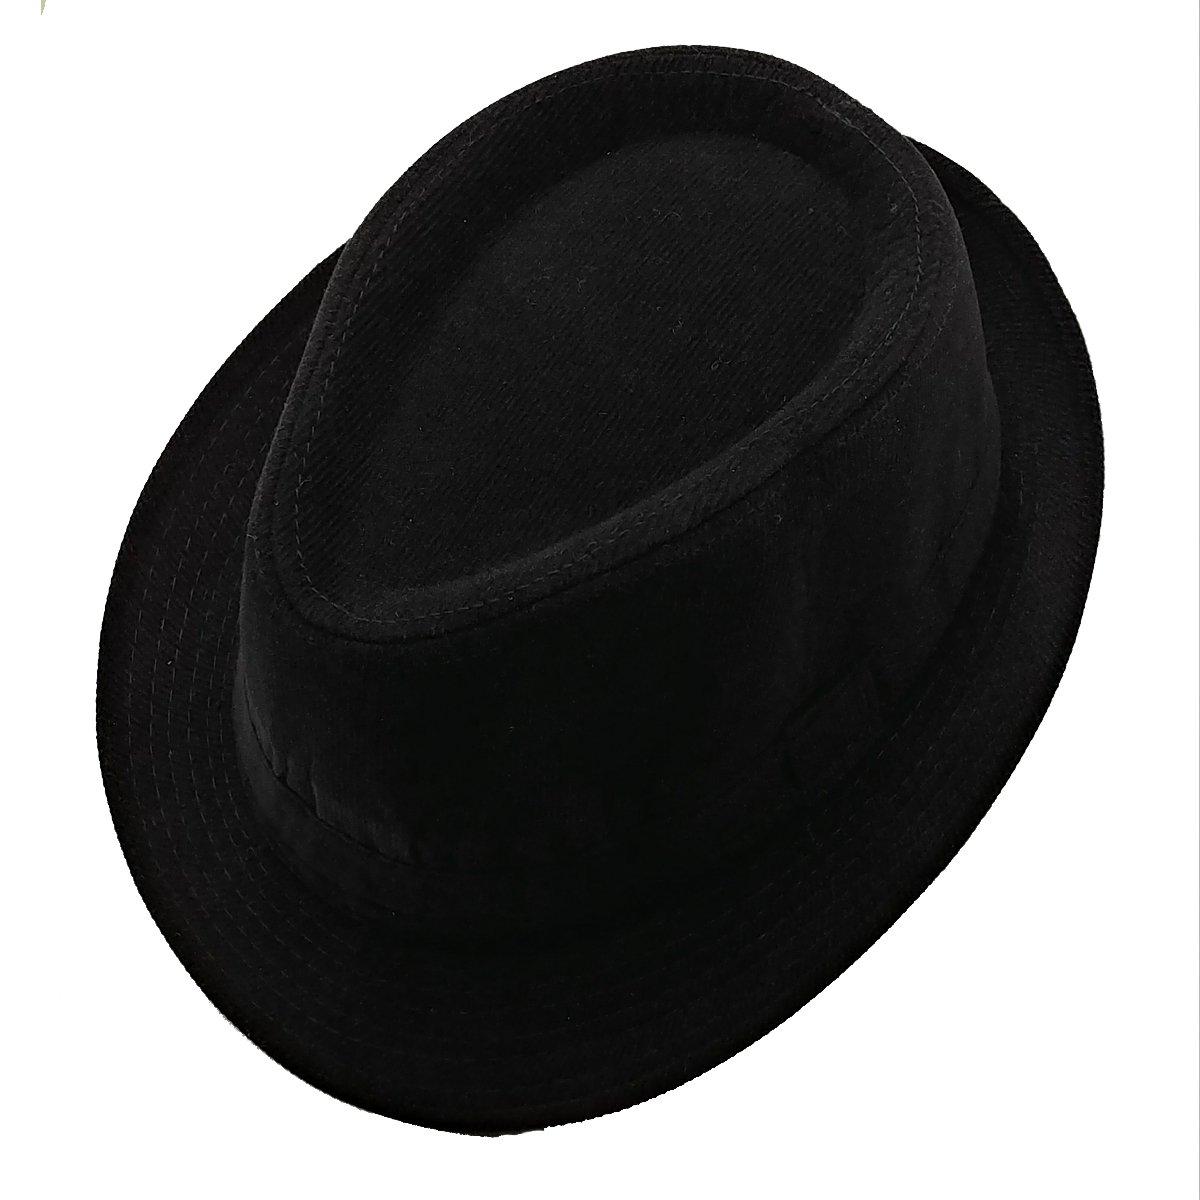 List A Mens Velvet Fedora Hat Selections - Stylish Trilby Panama Hat  (Black) at Amazon Men s Clothing store  39eea331cee